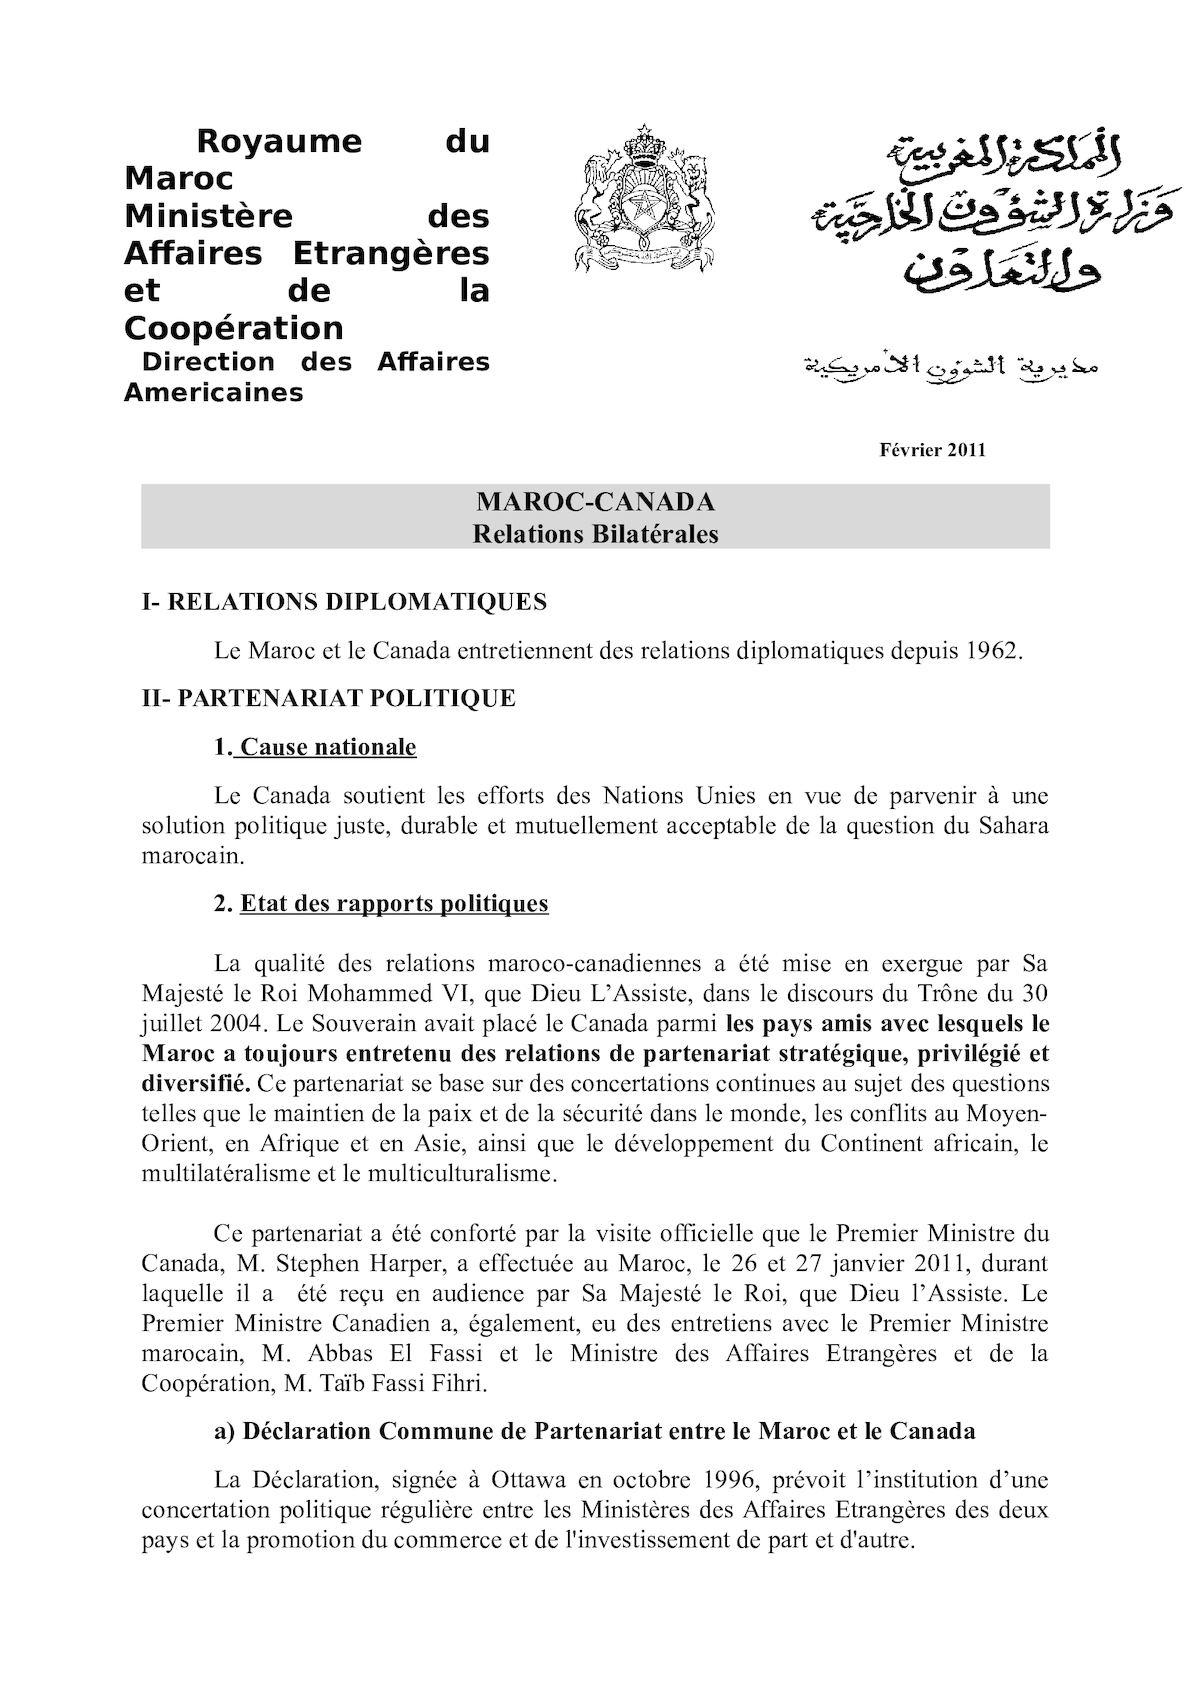 Fiche SUCCINTE Relations Bilaterales  2011 (3).